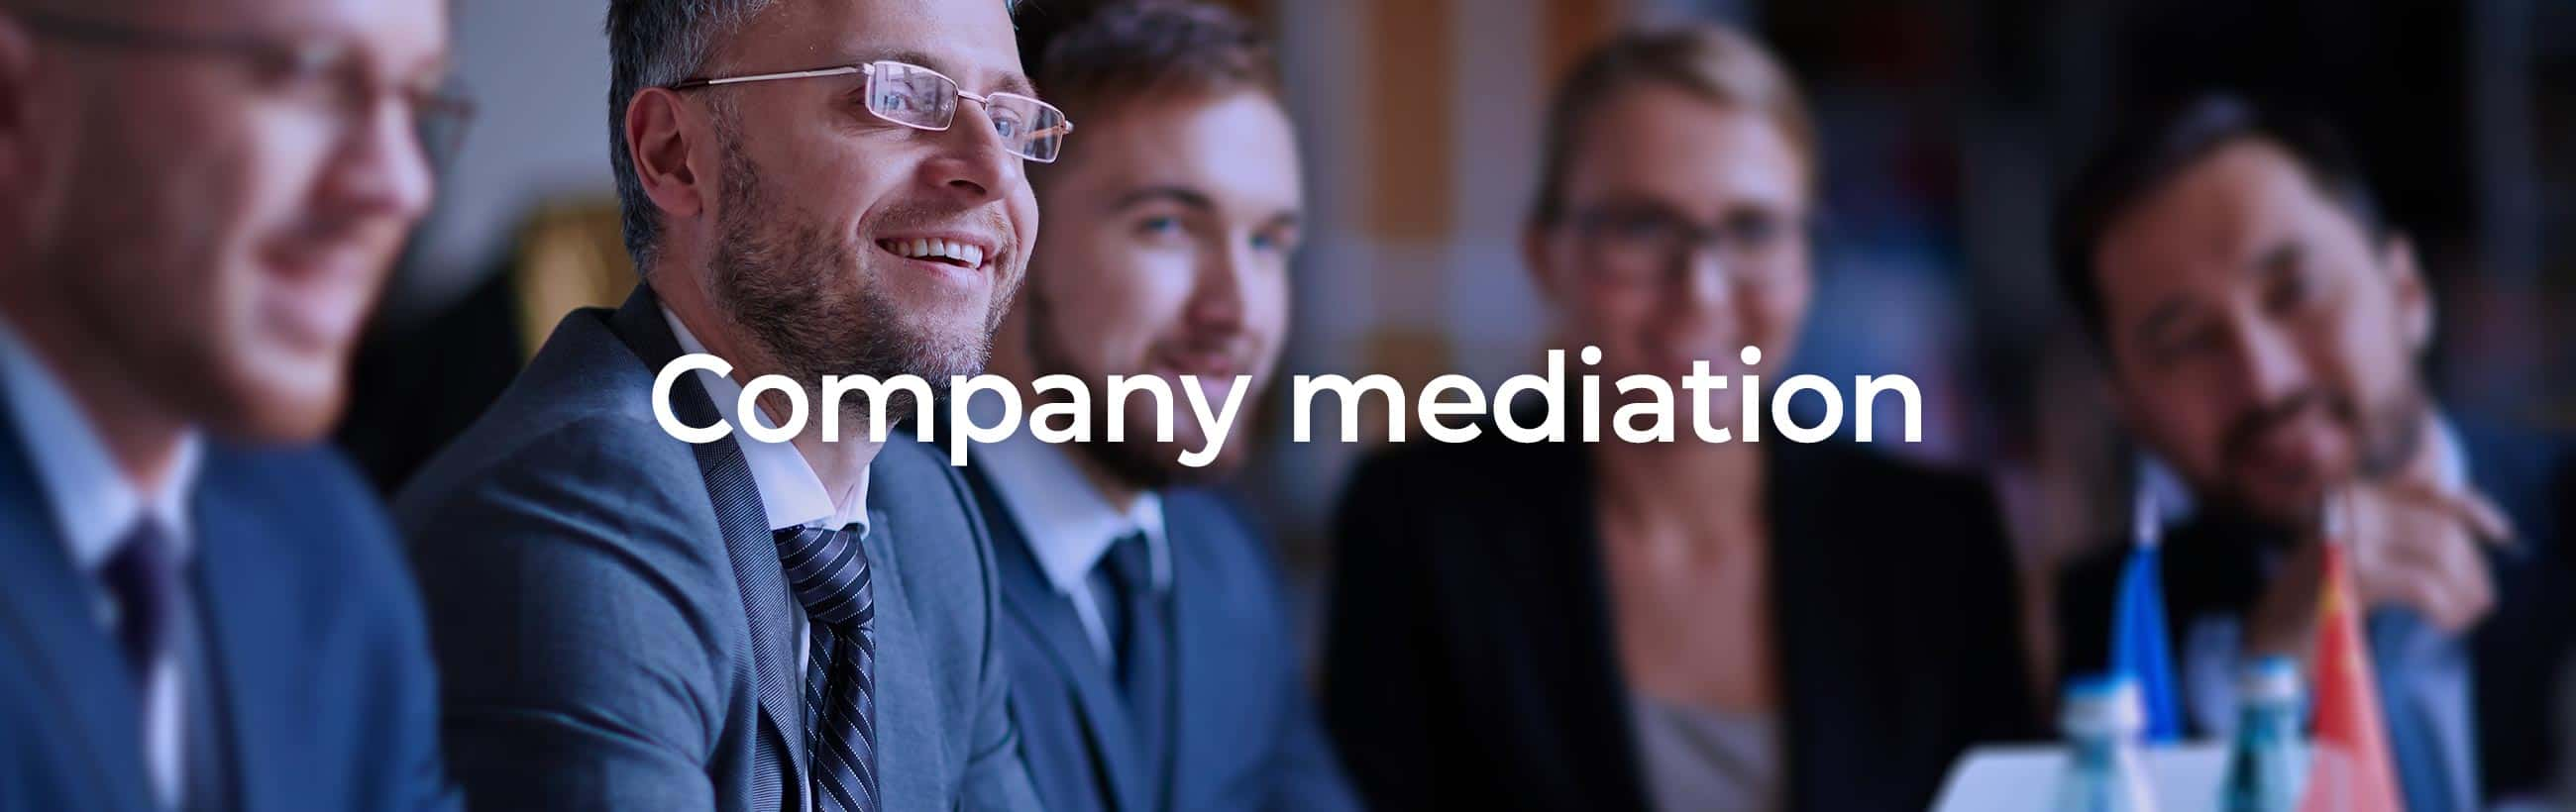 Blueberry Hill - Company mediation